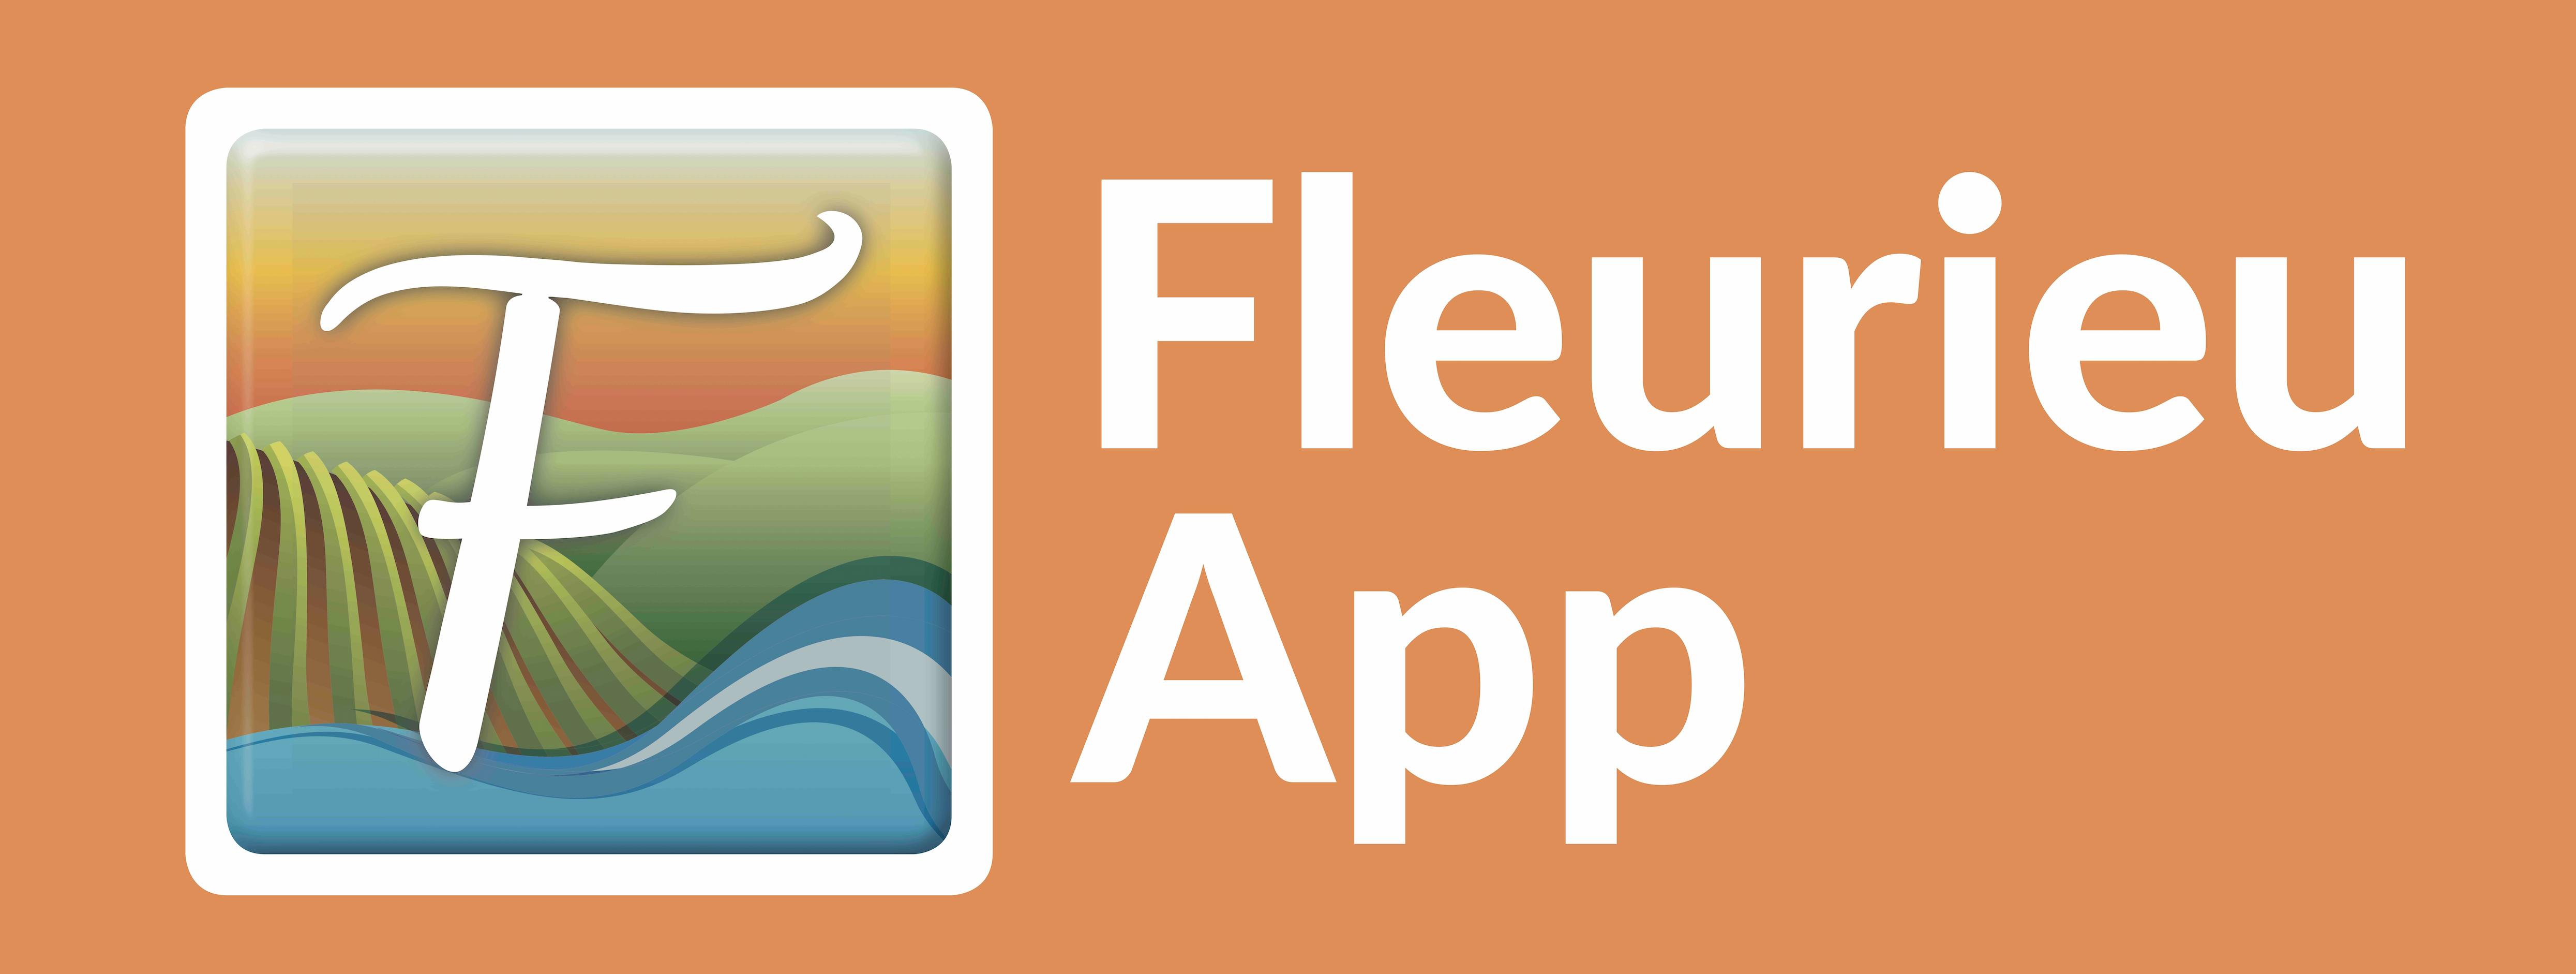 Fleurieu App Logo 4 - bevel rounded xtraxtrasmall